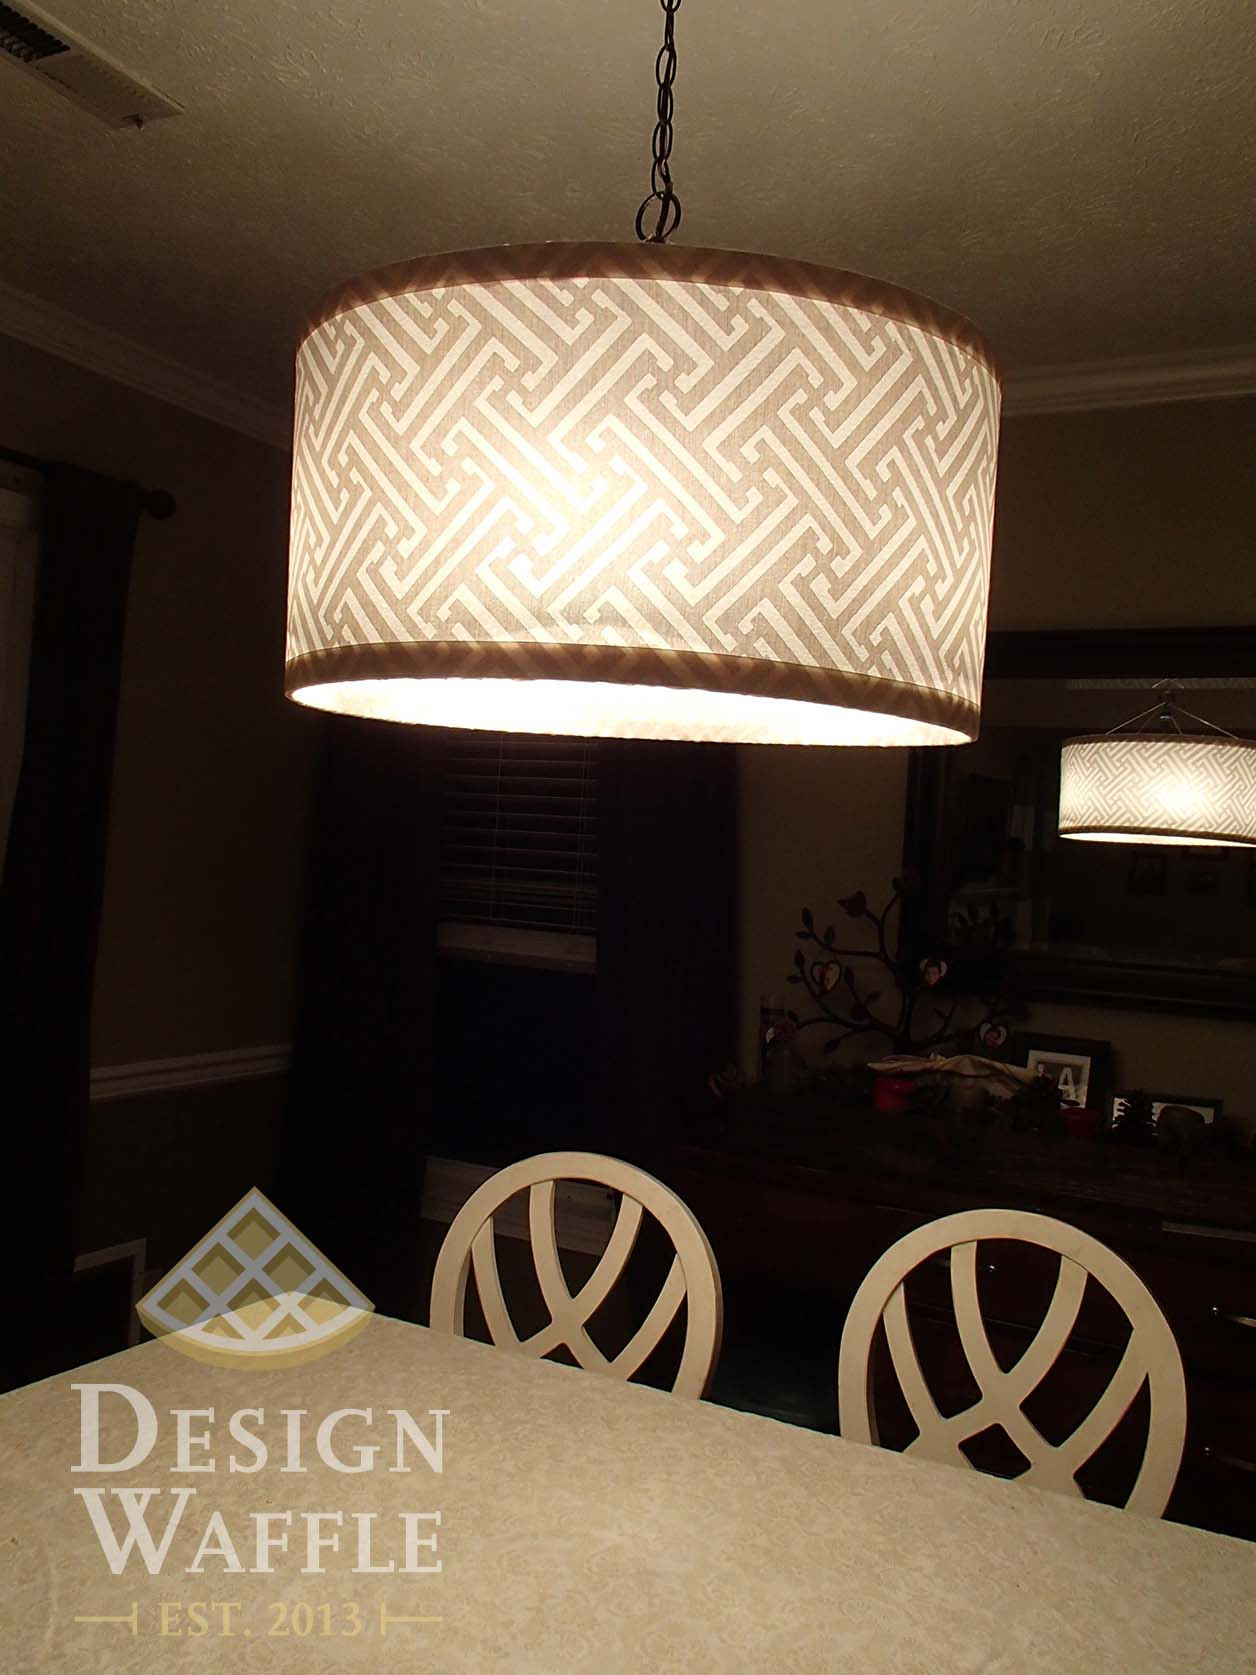 diy chandelier drum shade design waffle